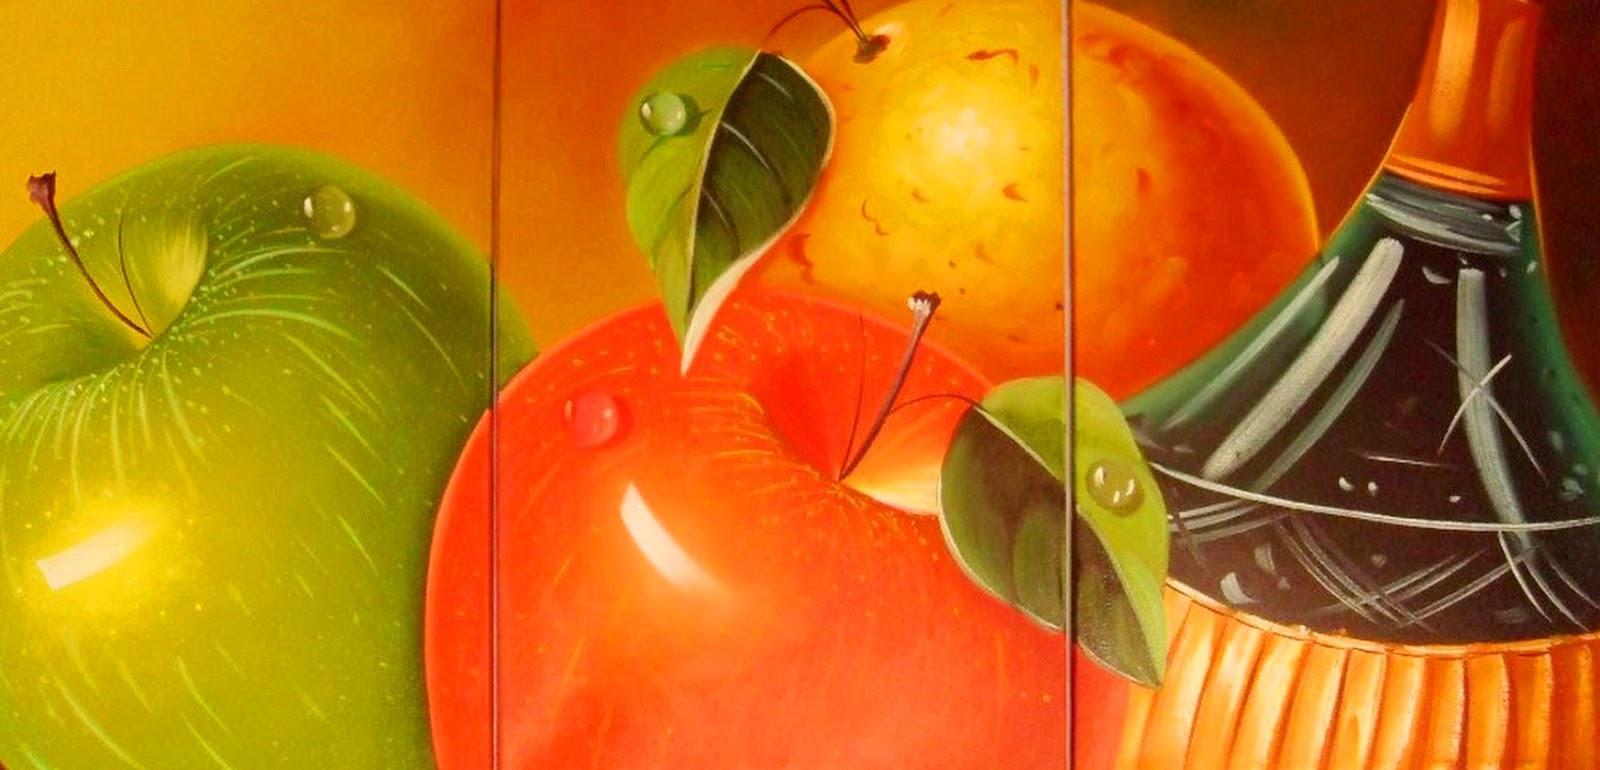 Im genes arte pinturas im genes de bodegones al leo - Pinturas bodegones modernos ...